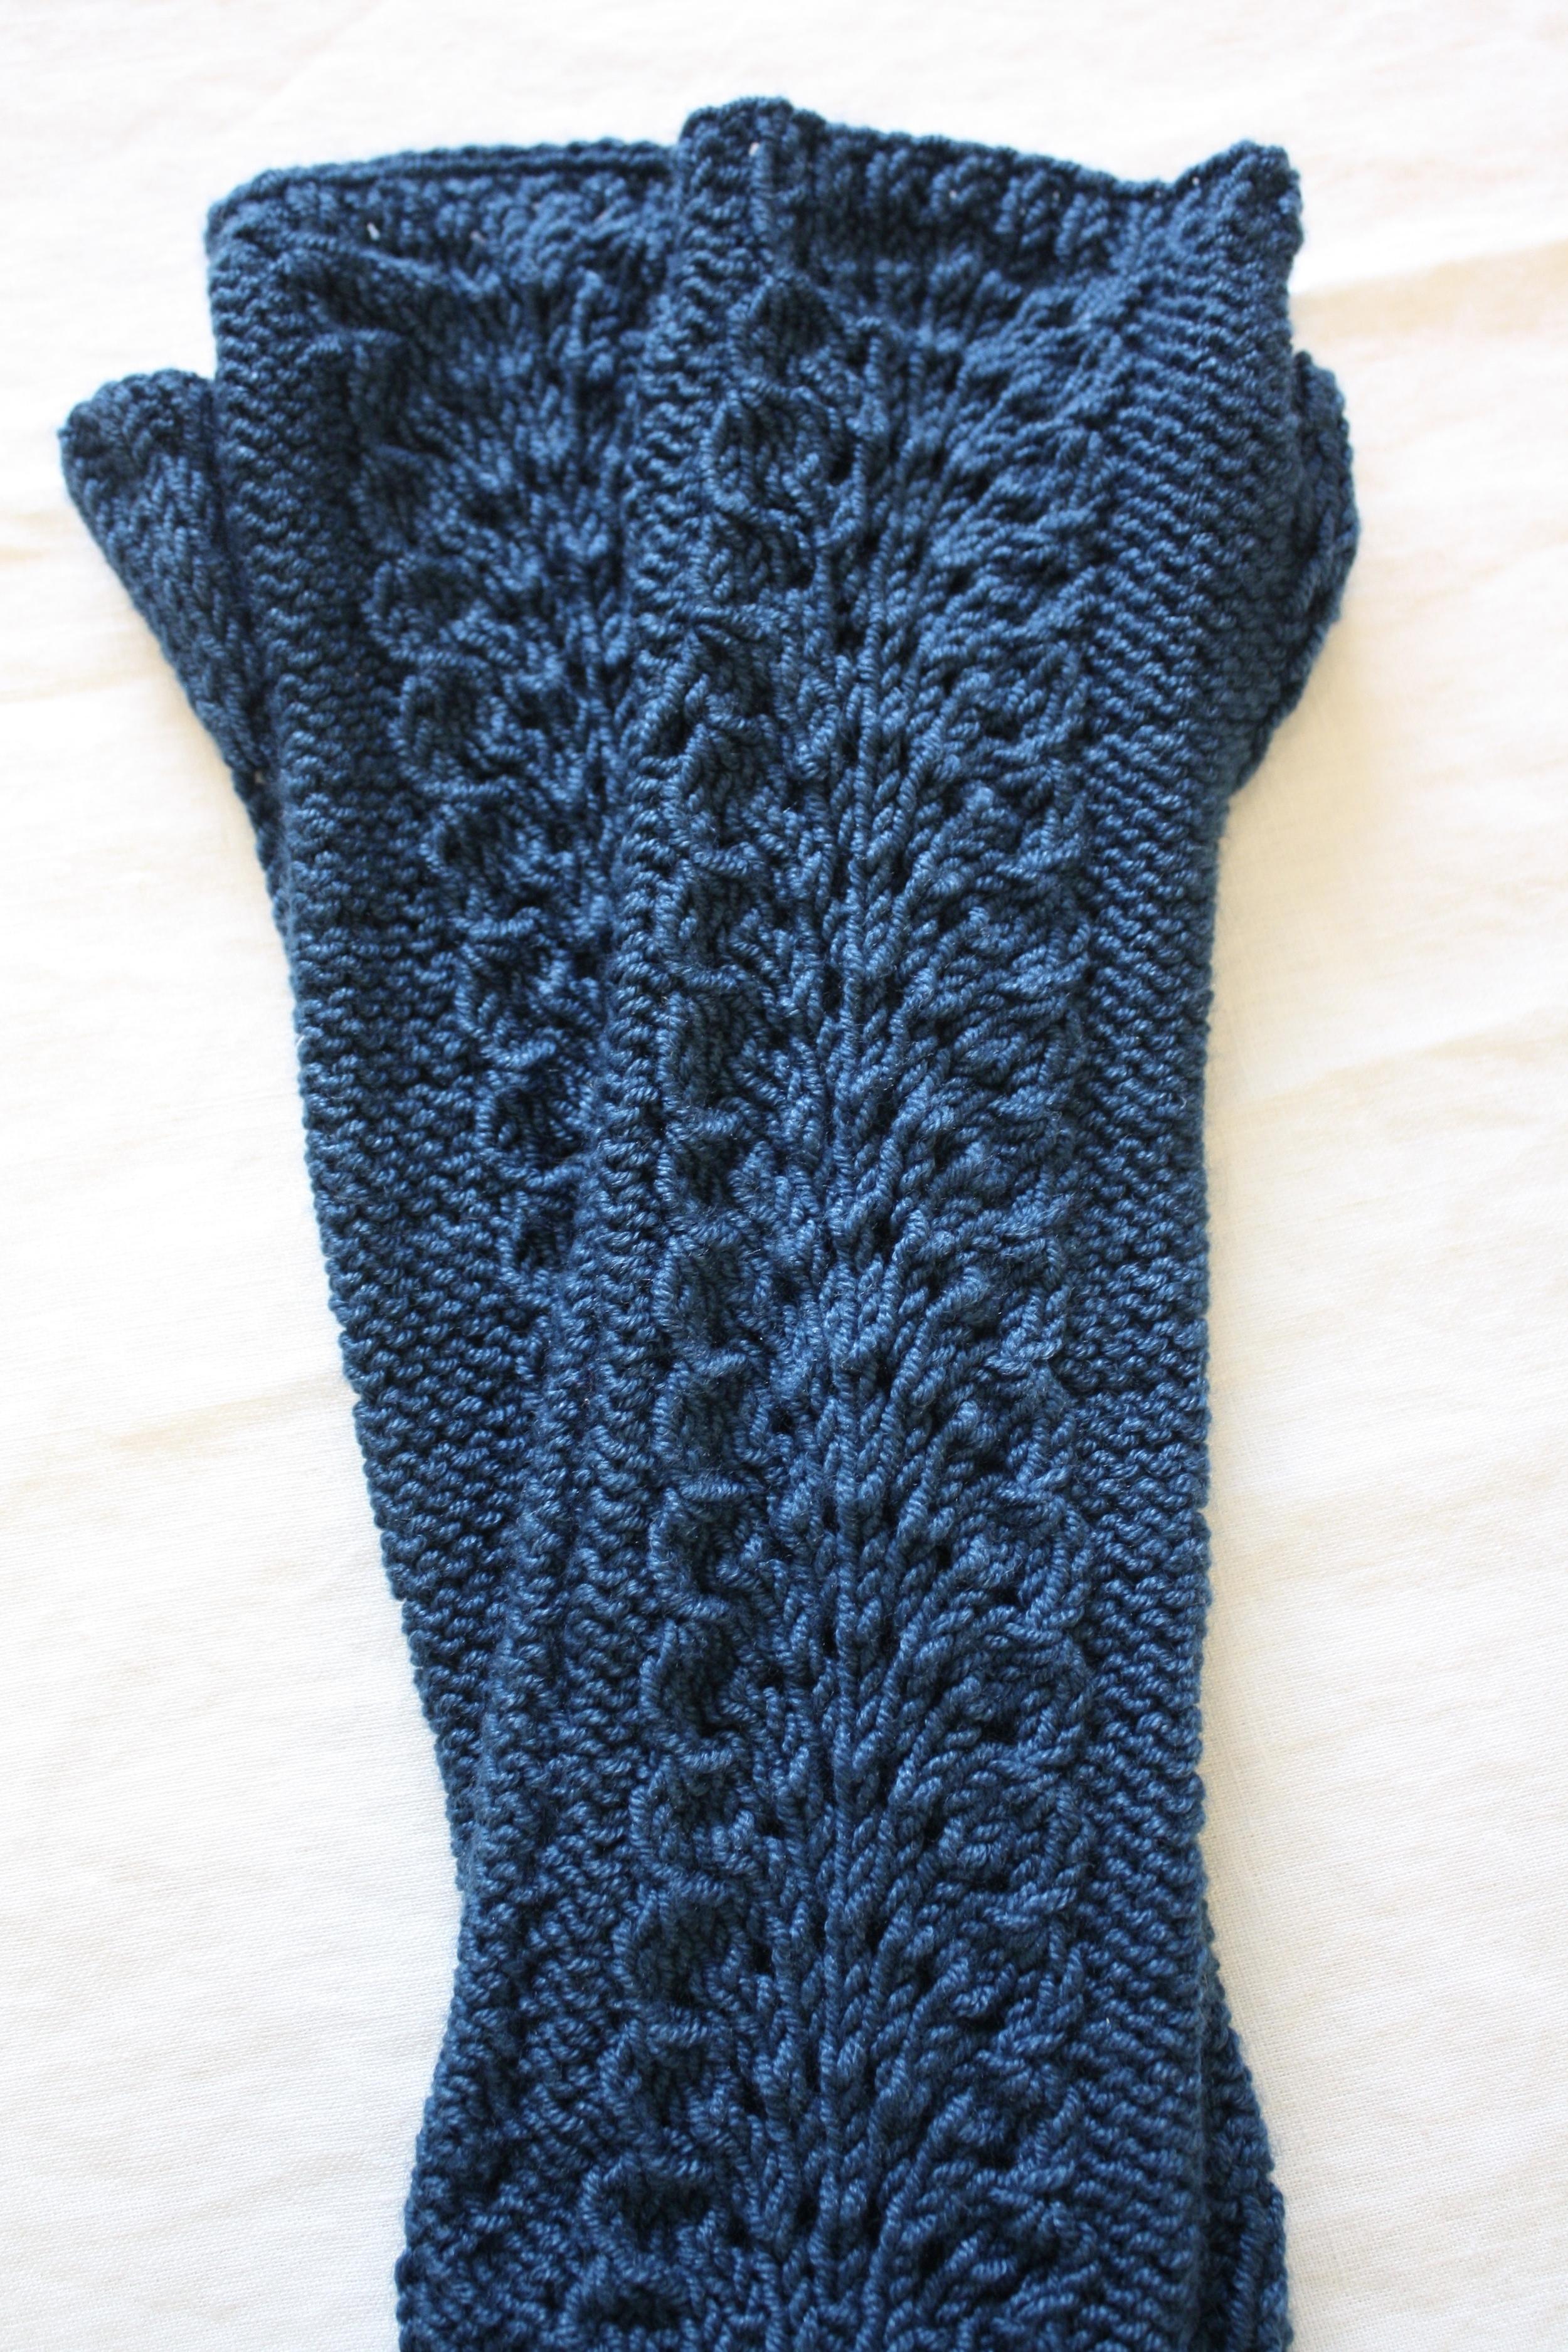 Lettuce Knit Arm Warmers Pattern, Stitch Nation by Debbie Stoller